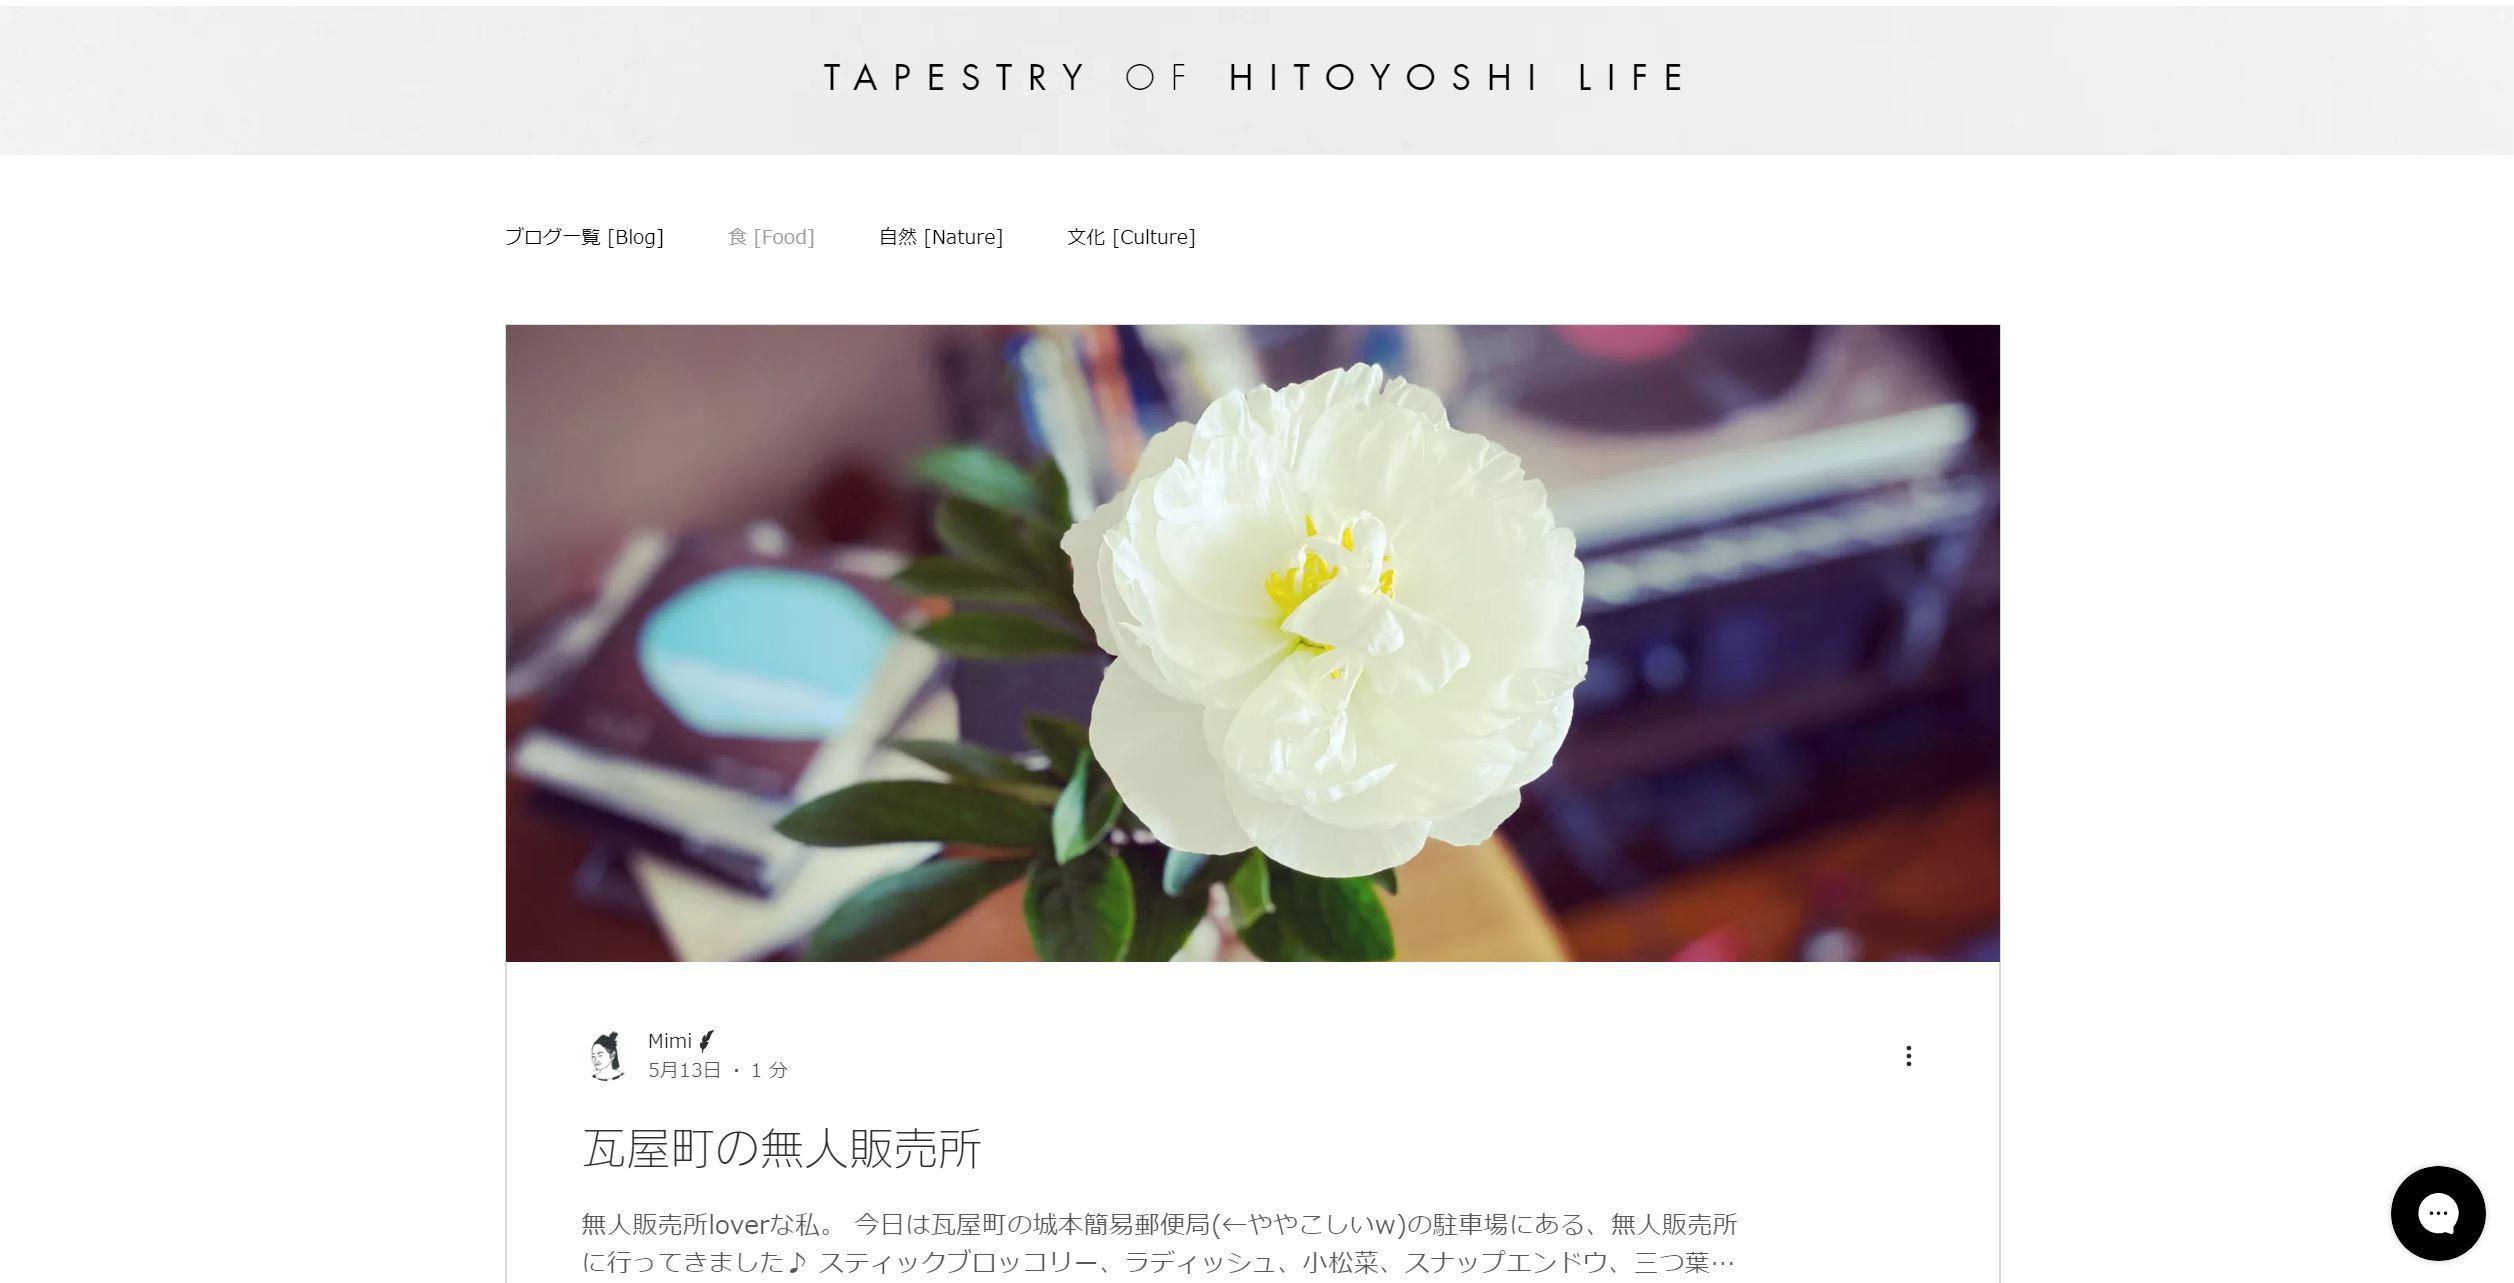 TAPESTRY OF HITOYOSHI LIFE